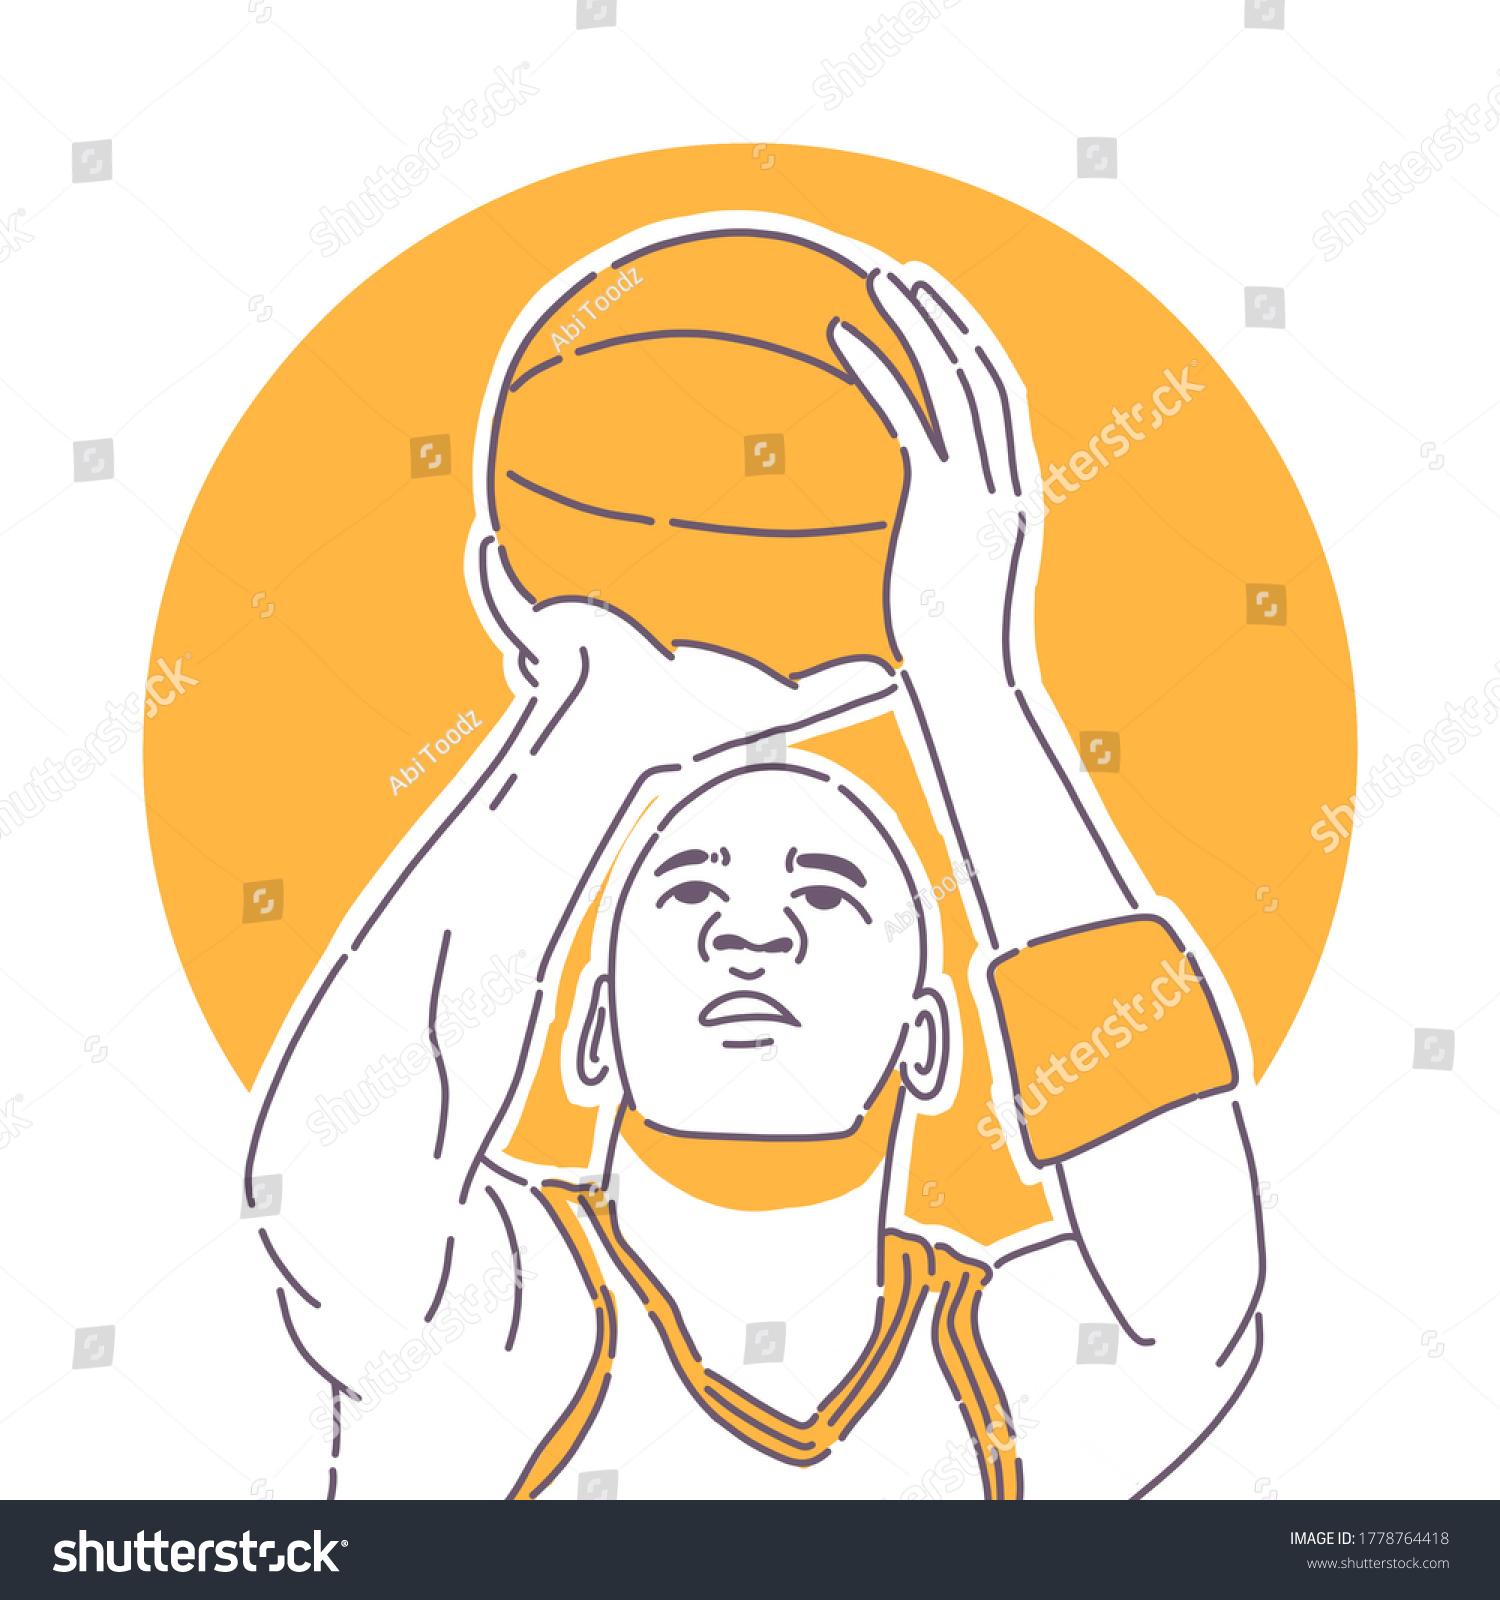 Michael Jordan Basket Ball Illustration Suitable Wallpaper Murals